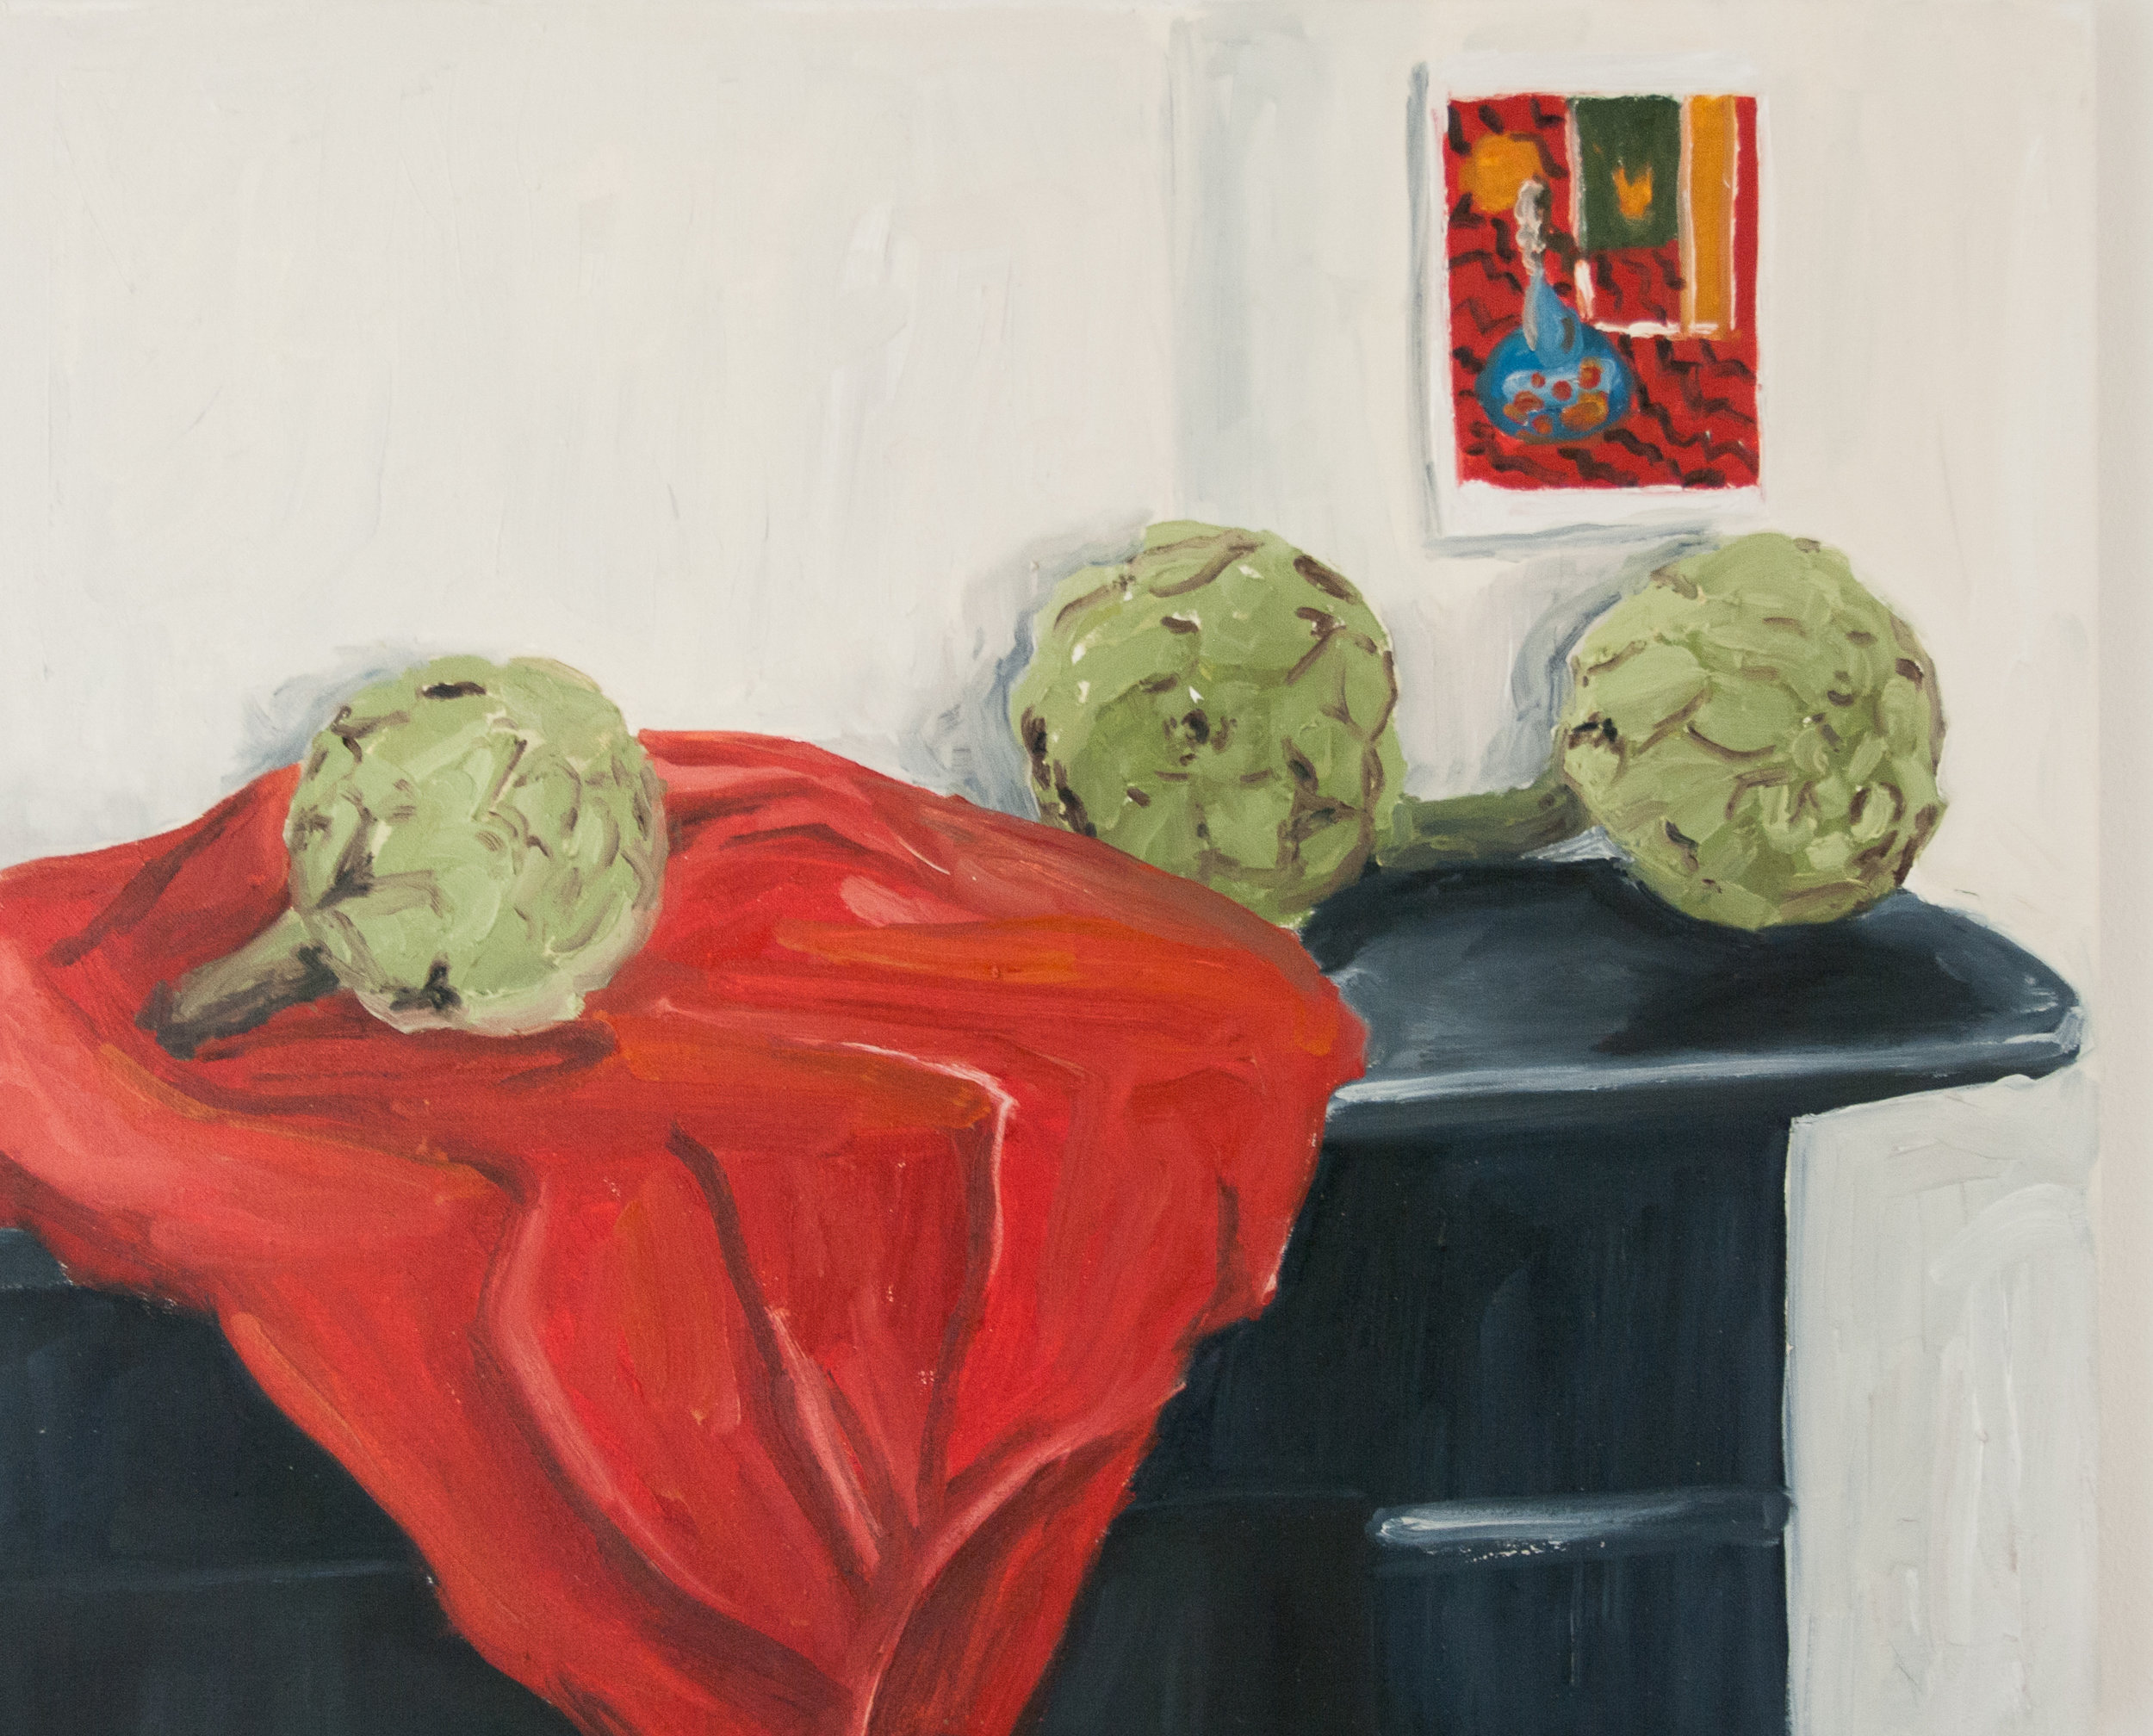 Artichokes and Matisse. 60x50cm. Oil on linen canvas. 2016.